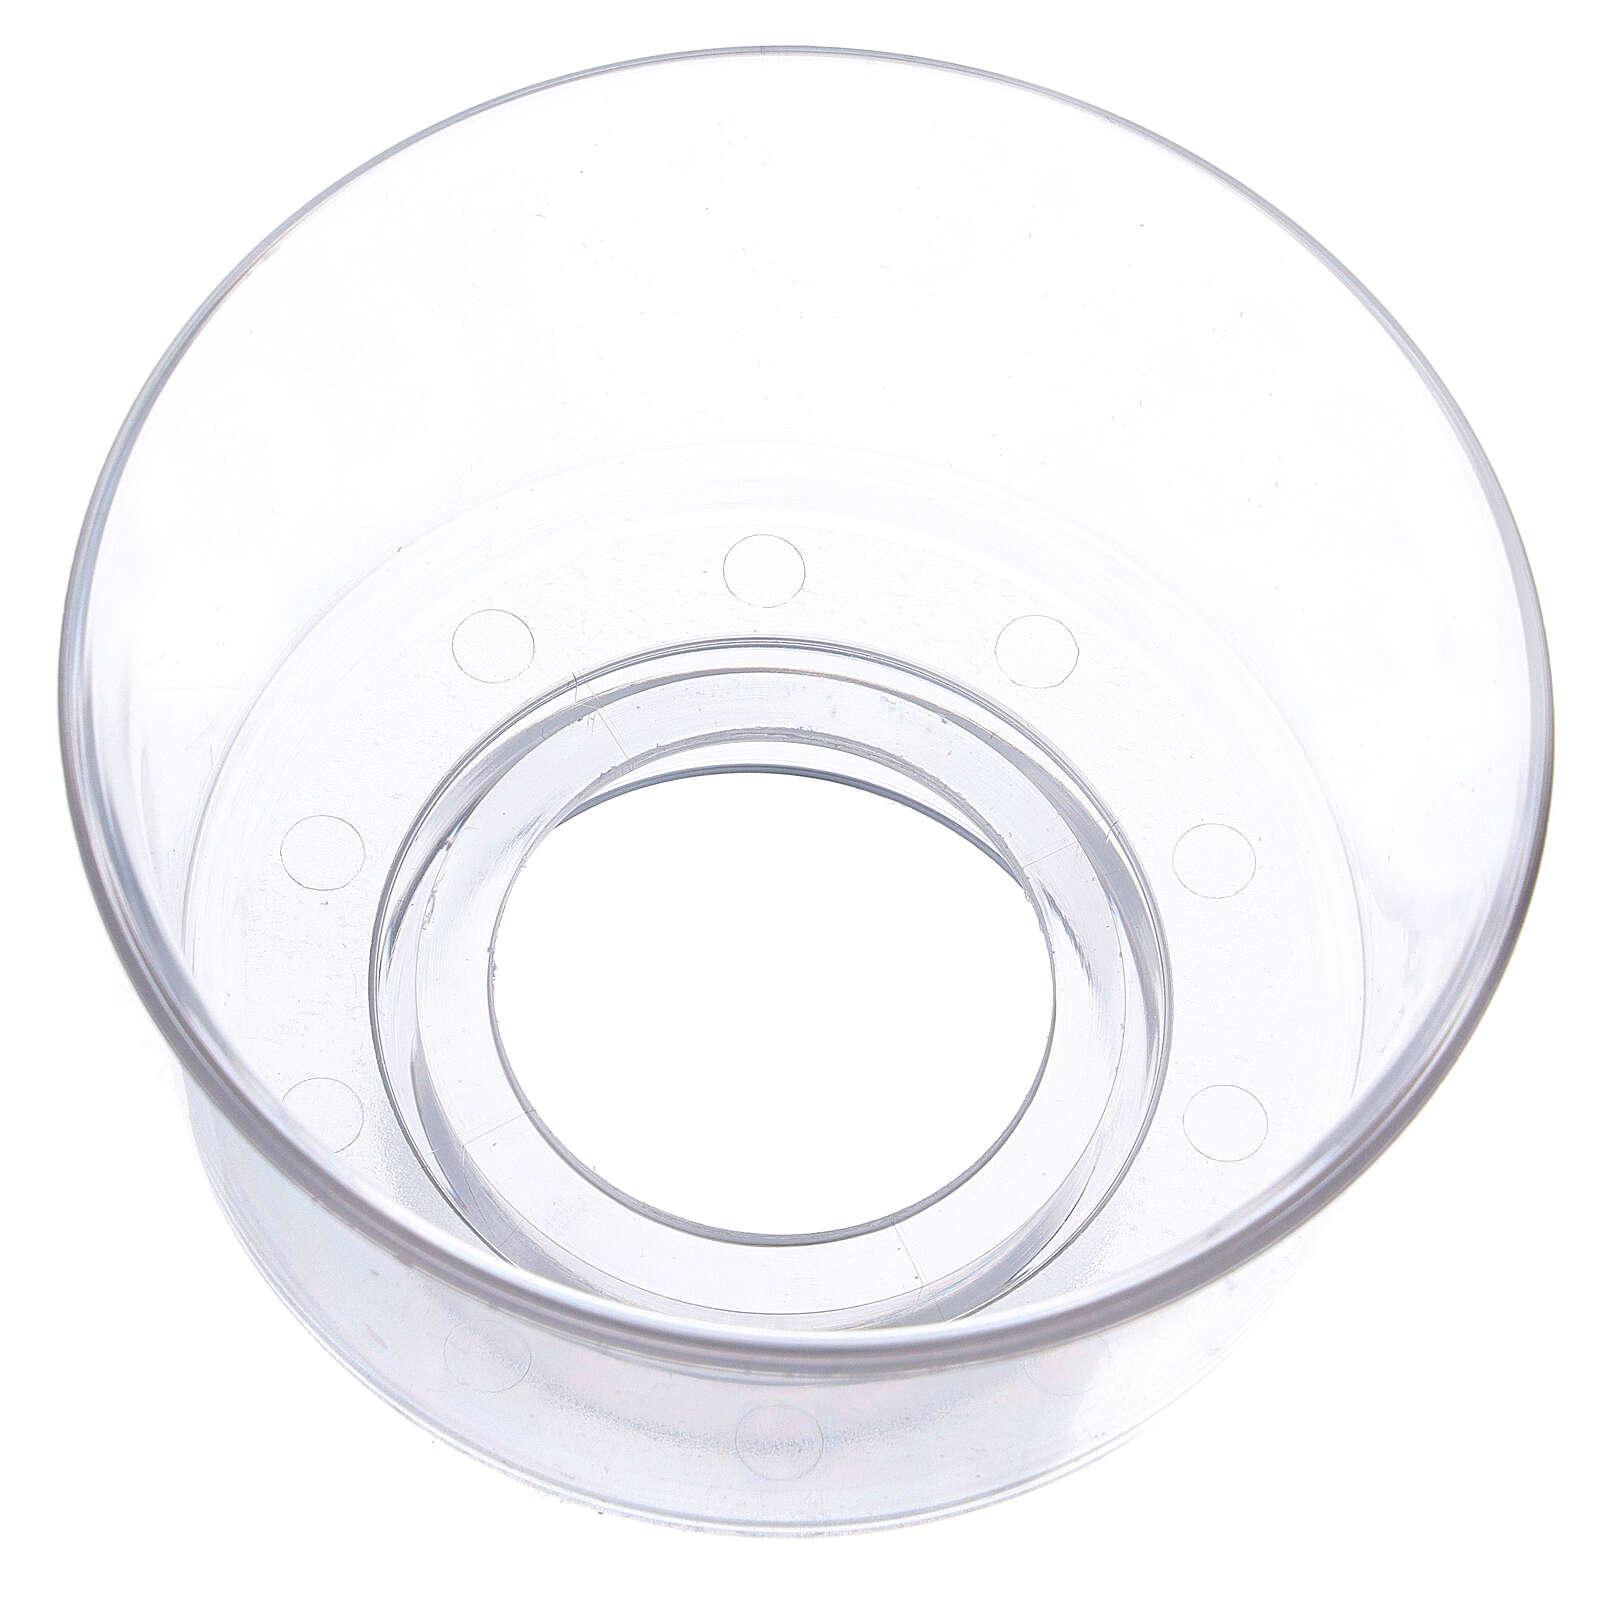 Parafiamma per candela di diametro 4 cm 3